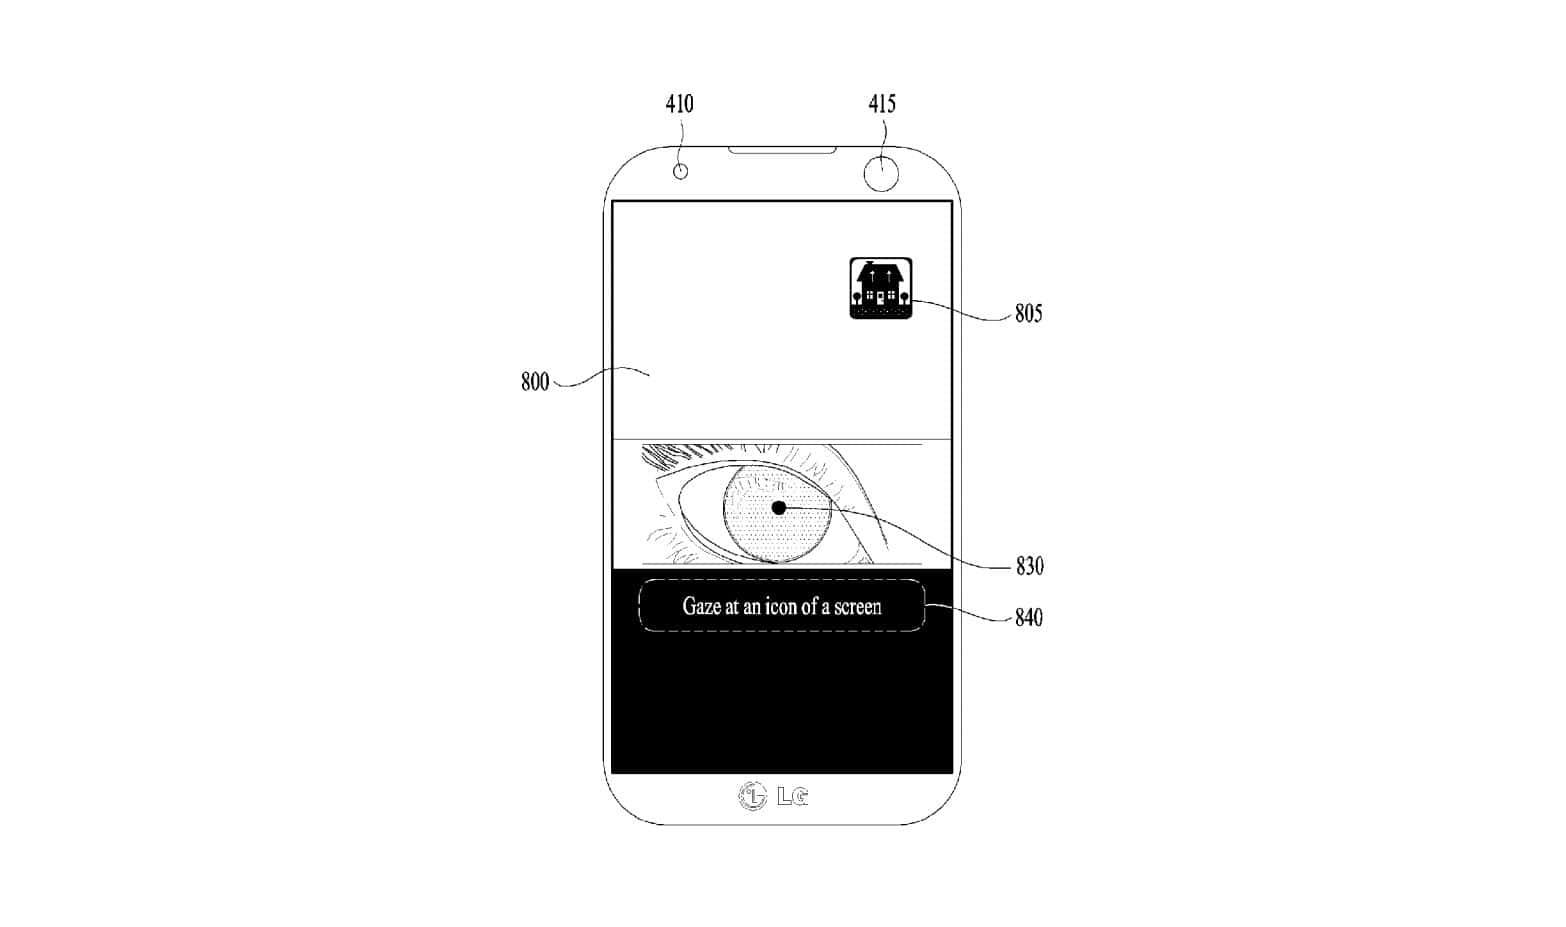 LG Iris WIPO Patent 7